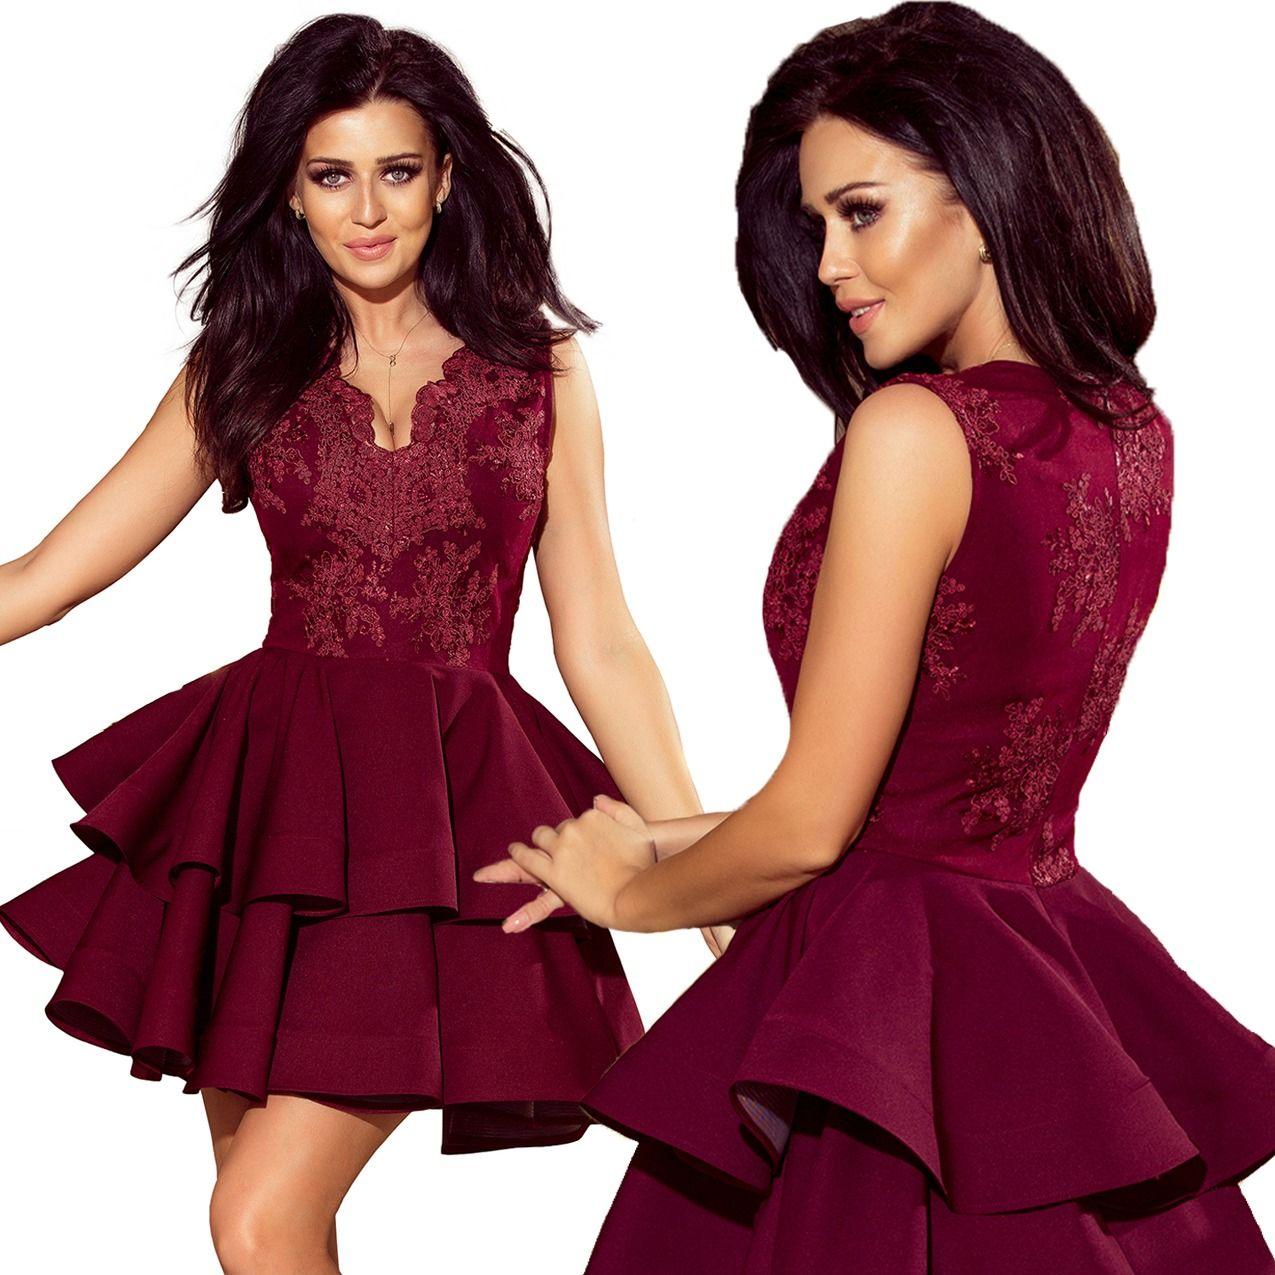 Ekskluzywna Sukienka Koronkowy Dekolt Bordowa M Fashion Formal Dresses Dresses